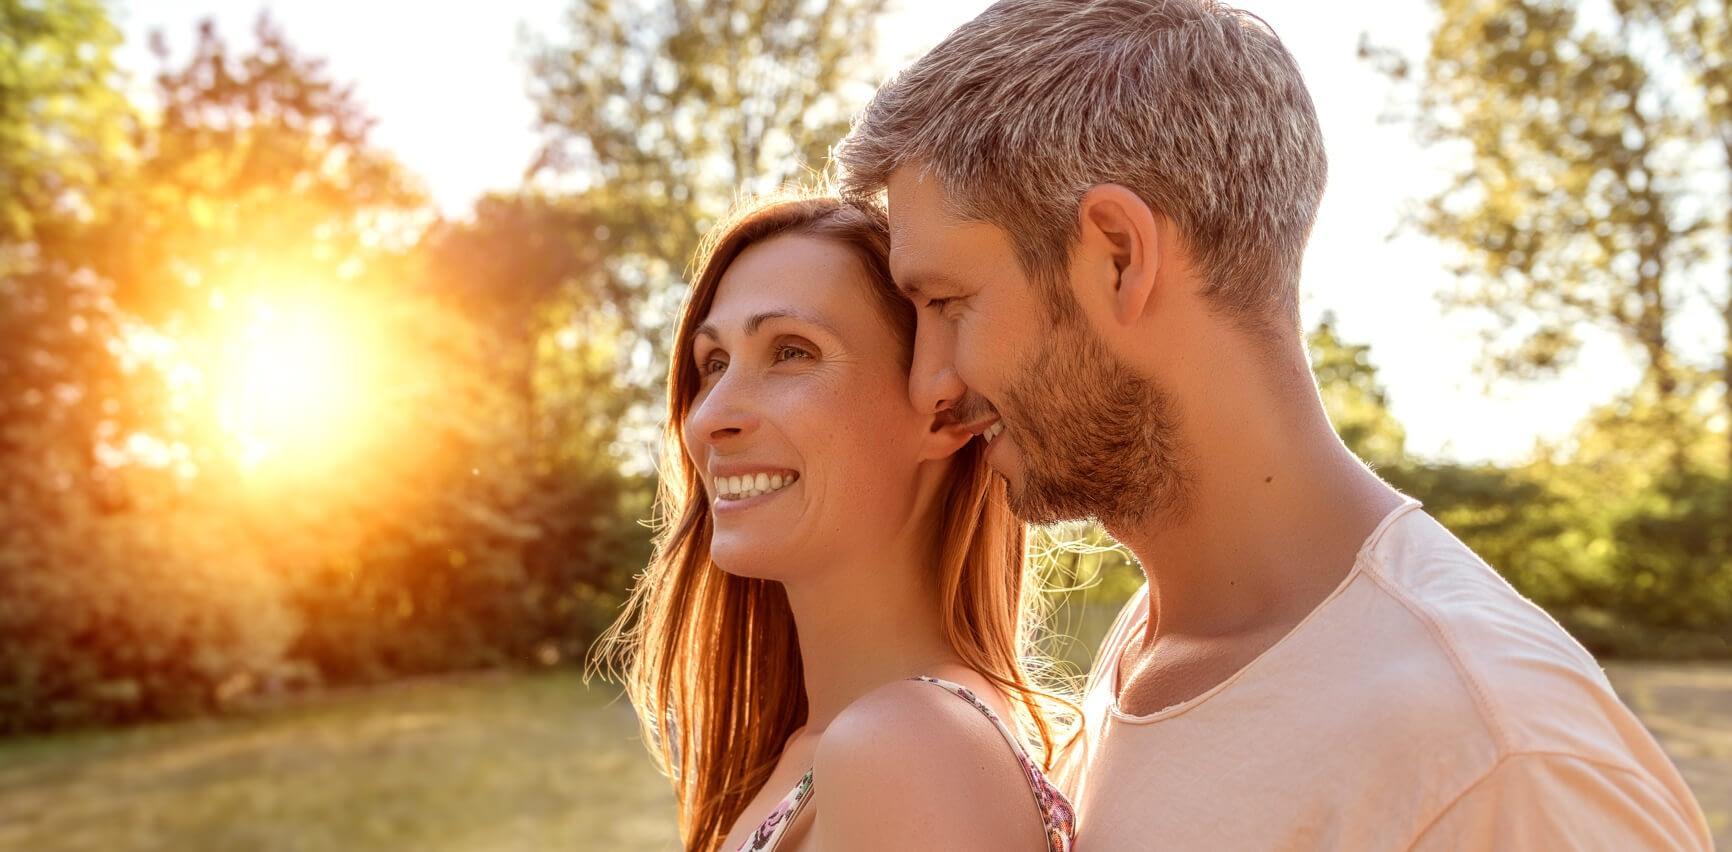 Fertility Treatment at WOOM